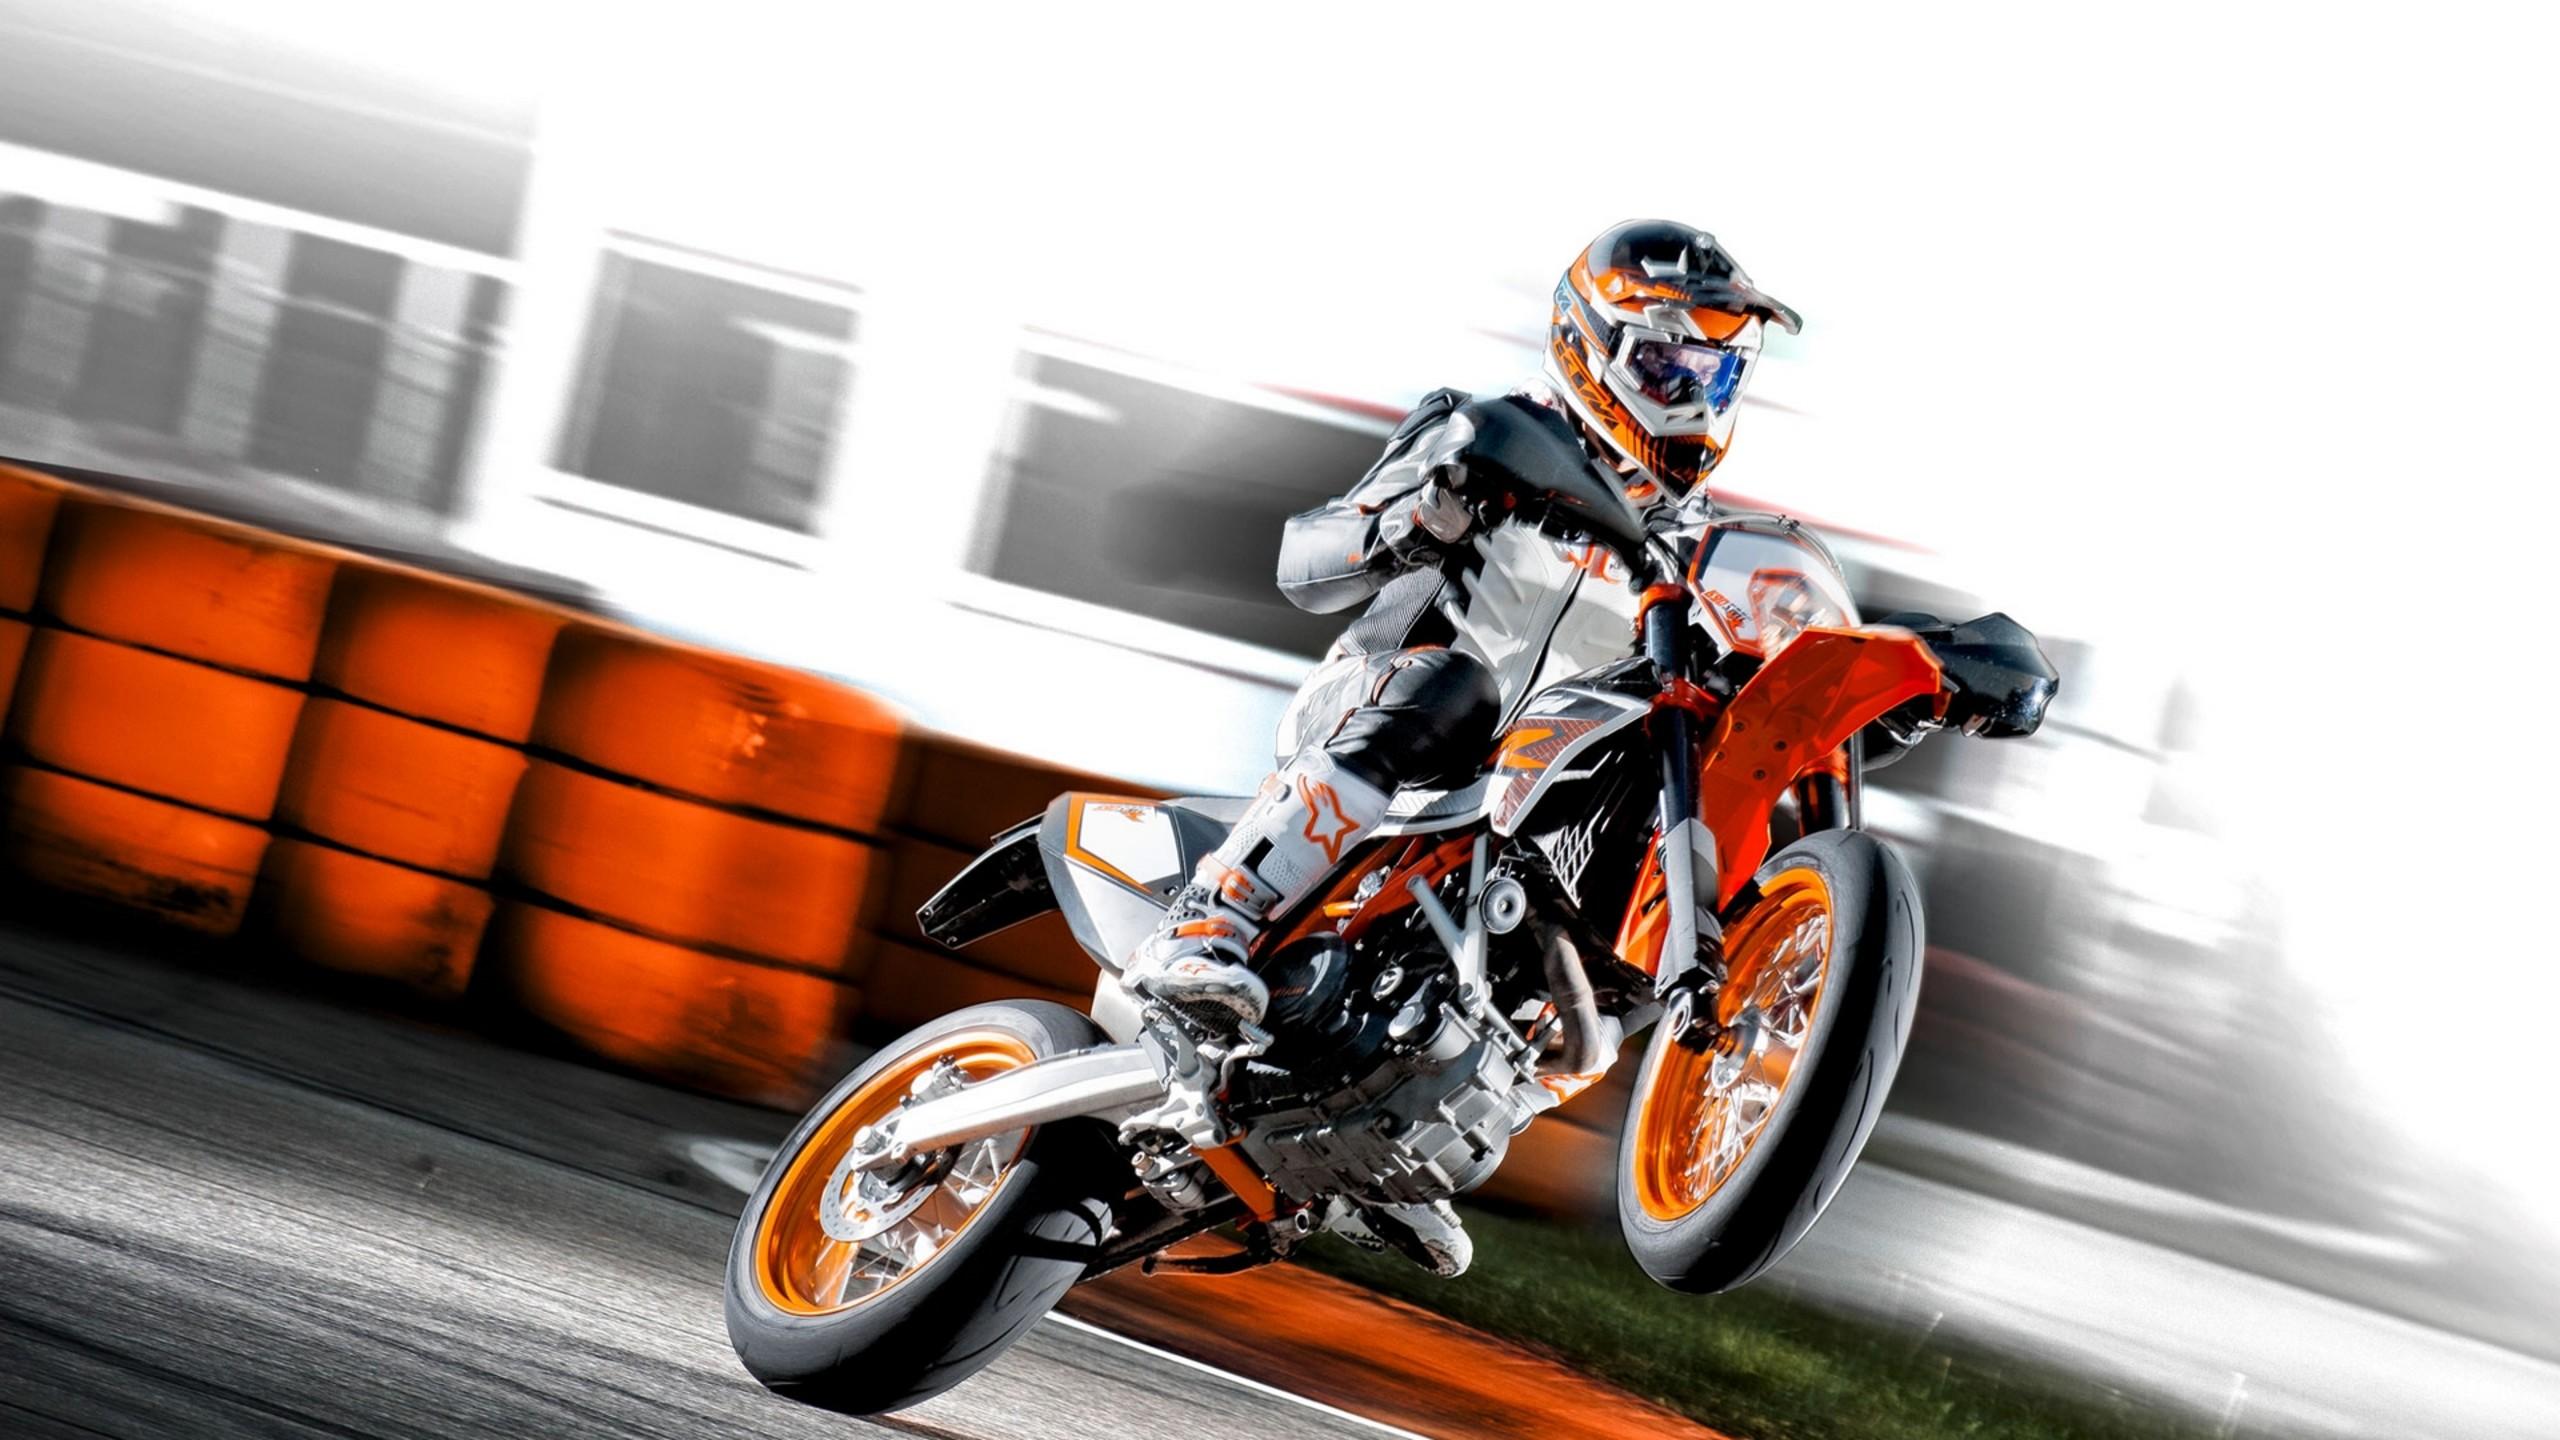 Wallpaper Download 2560x1440 Insane wheelies Ktm 690 SMC R on a racing 2560x1440